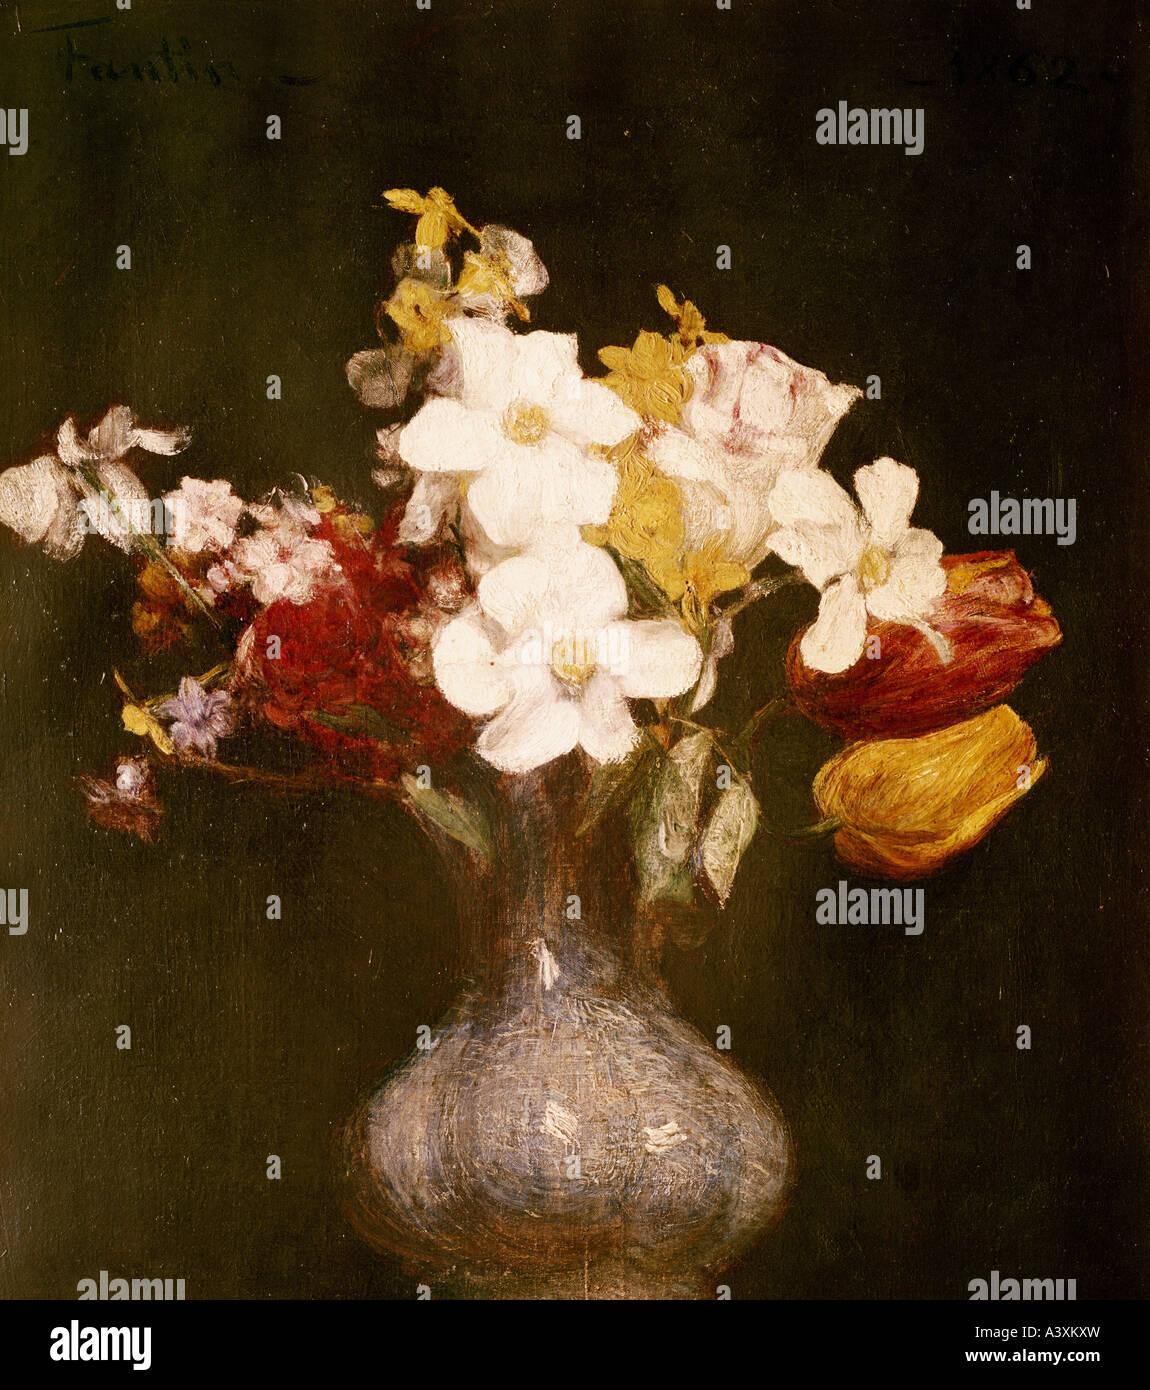 'fine arts, Fantin-Latour, Henri, (1836 - 1904), painting, 'daffodils and tulips', Louvre, Paris, historic, - Stock Image